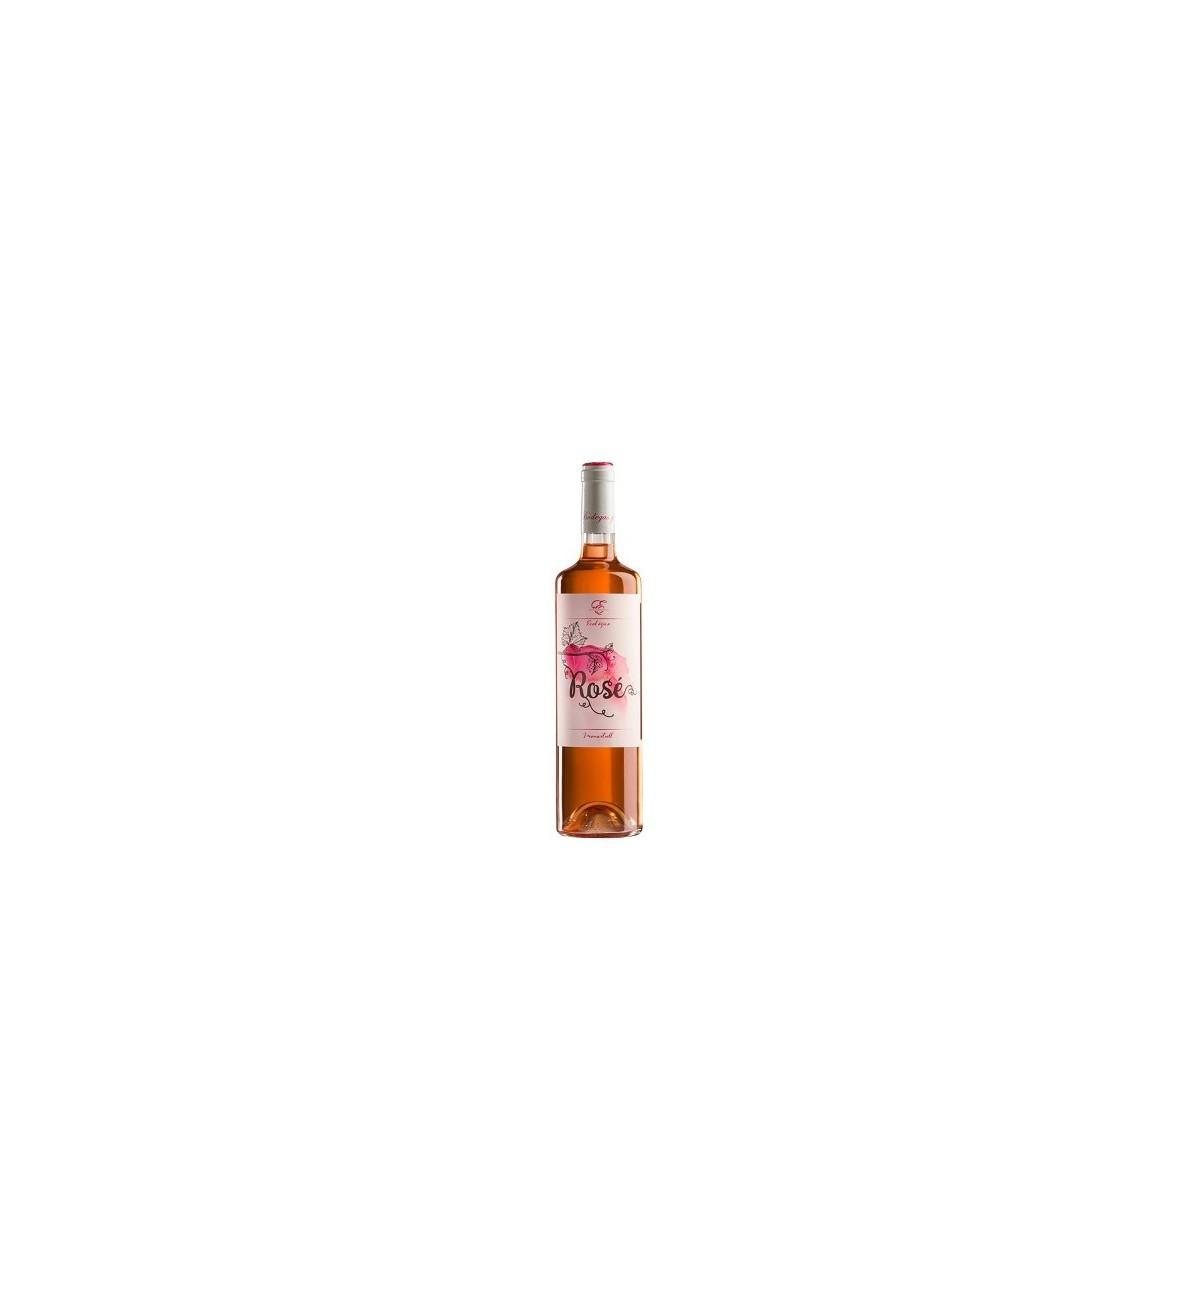 Evine Rosé 2018 - Vino Rosado Ecológico * Yecla Monastrell